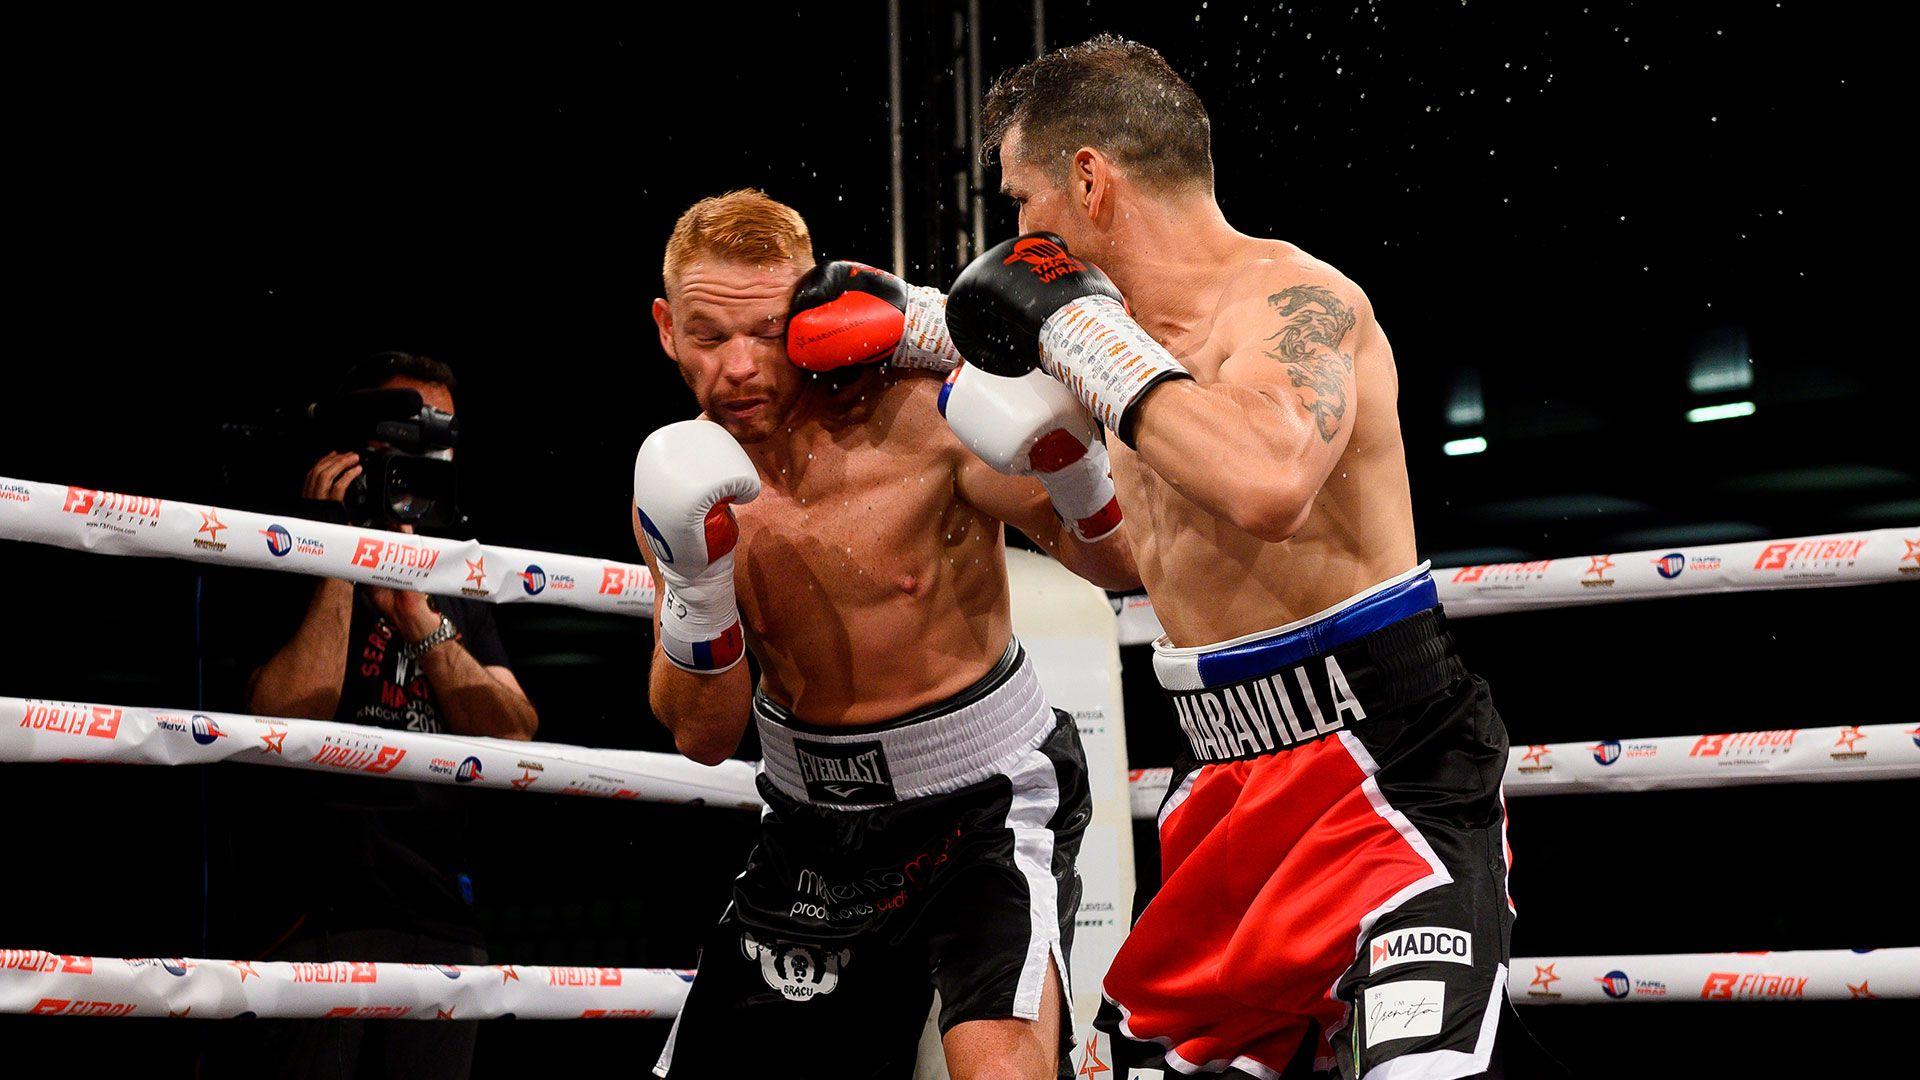 Sergio Maravilla Martinez contra el traumatologo fandiño pelea boxeo